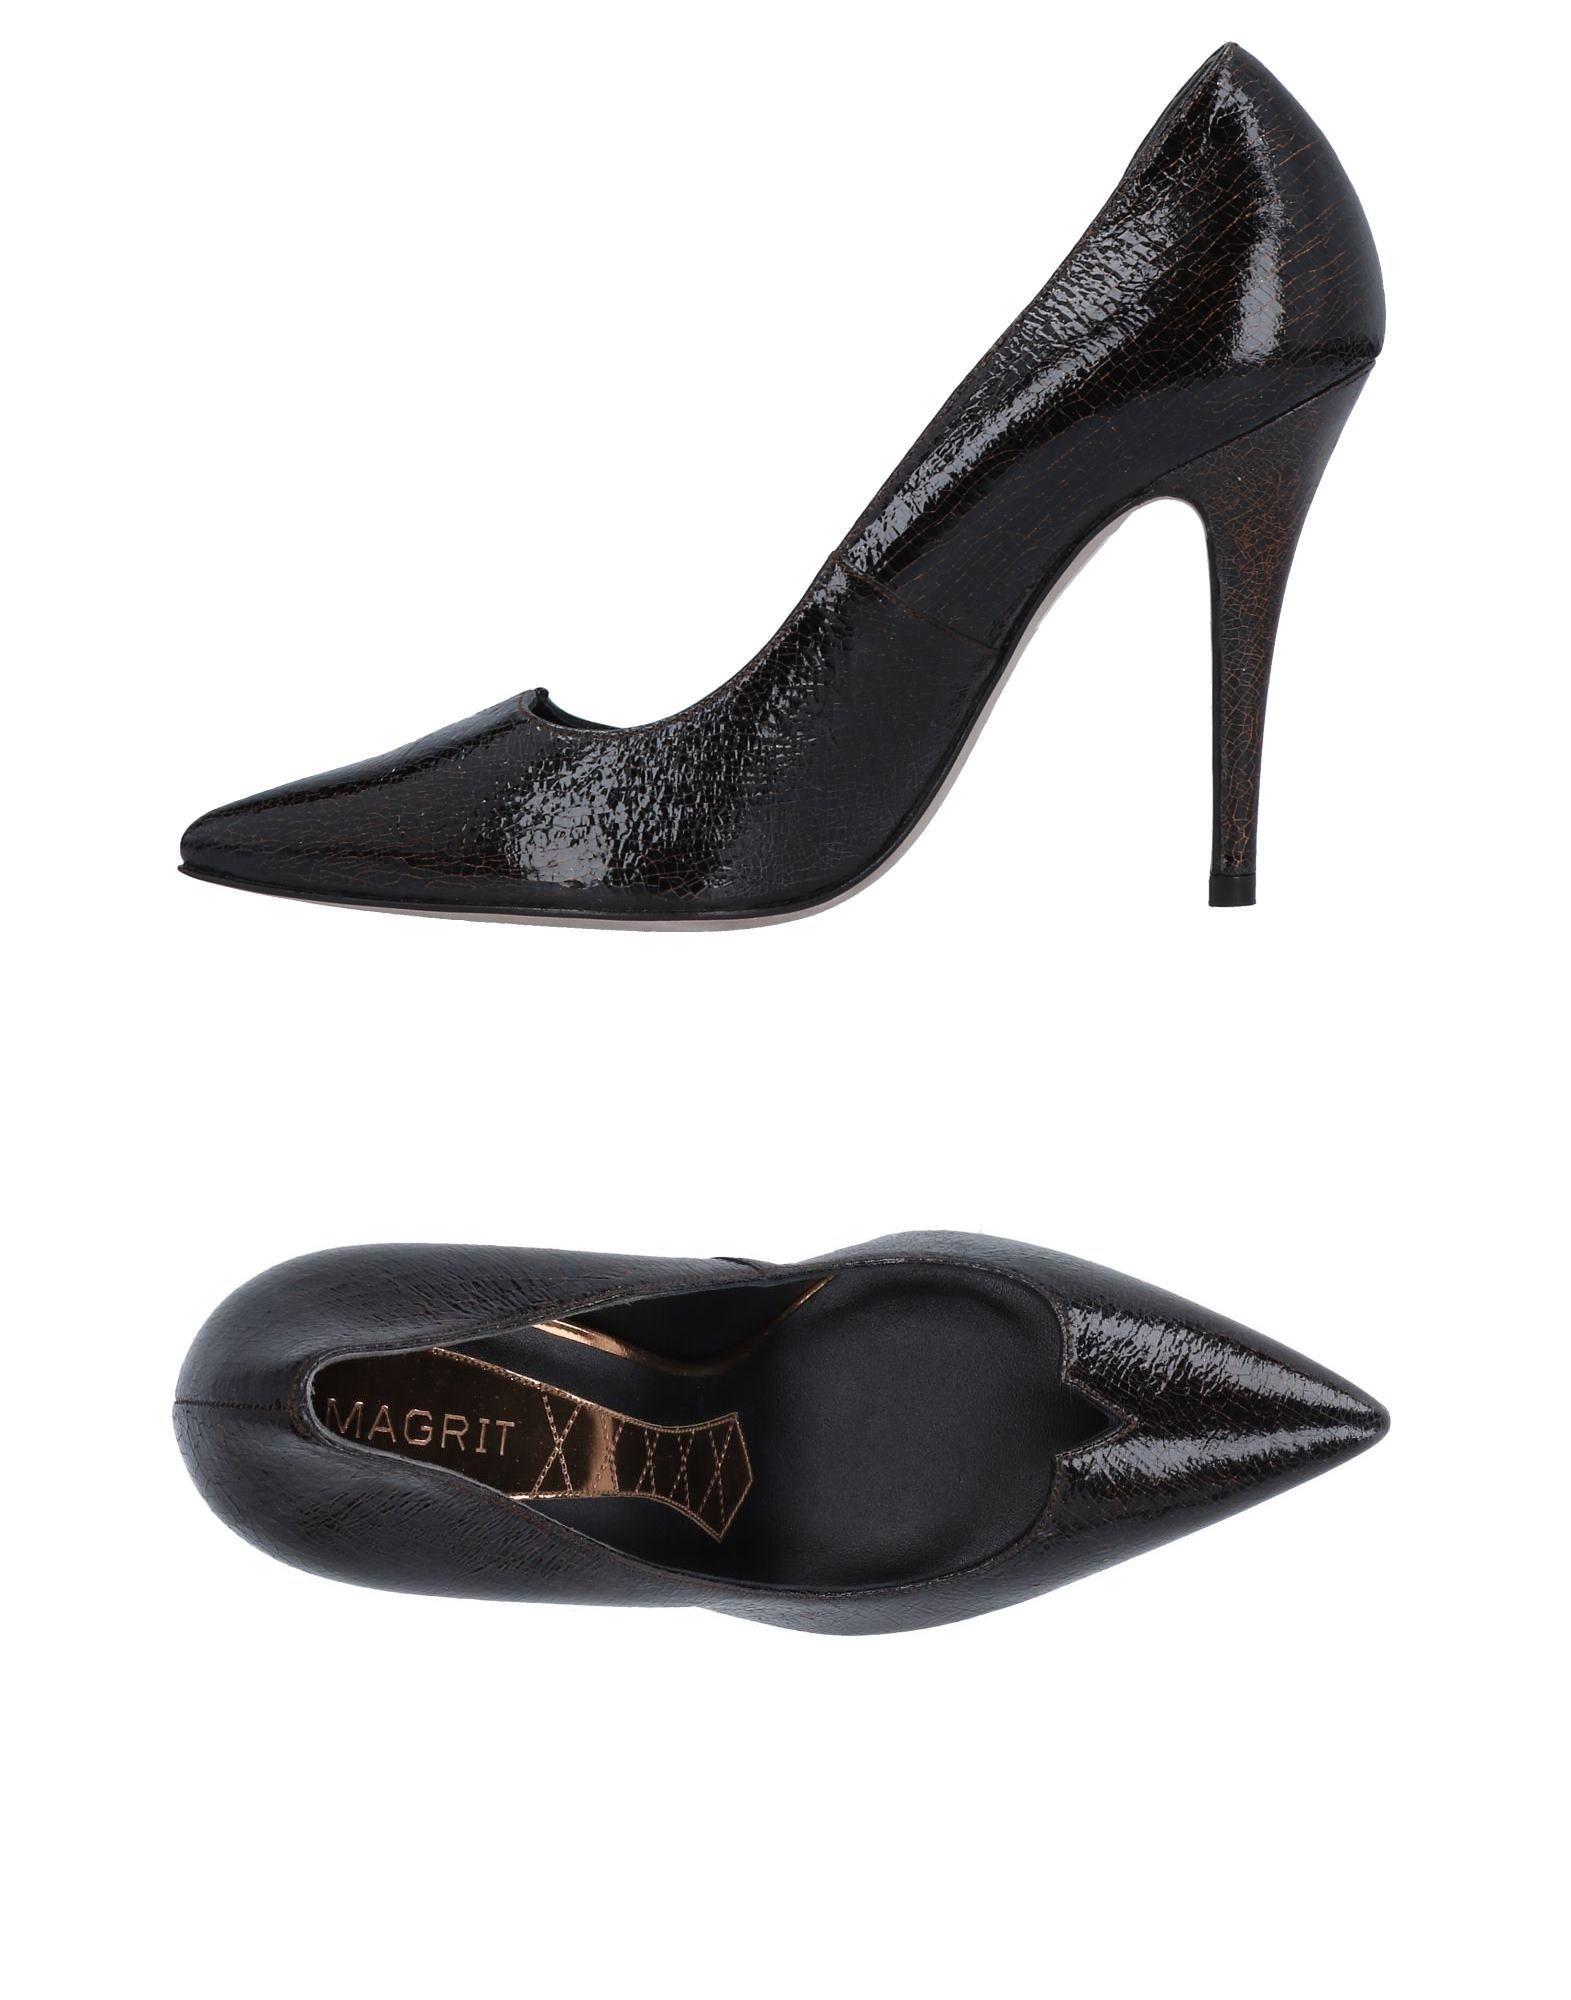 Stilvolle billige Schuhe Damen Magrit Pumps Damen Schuhe  11504303FB ef408e